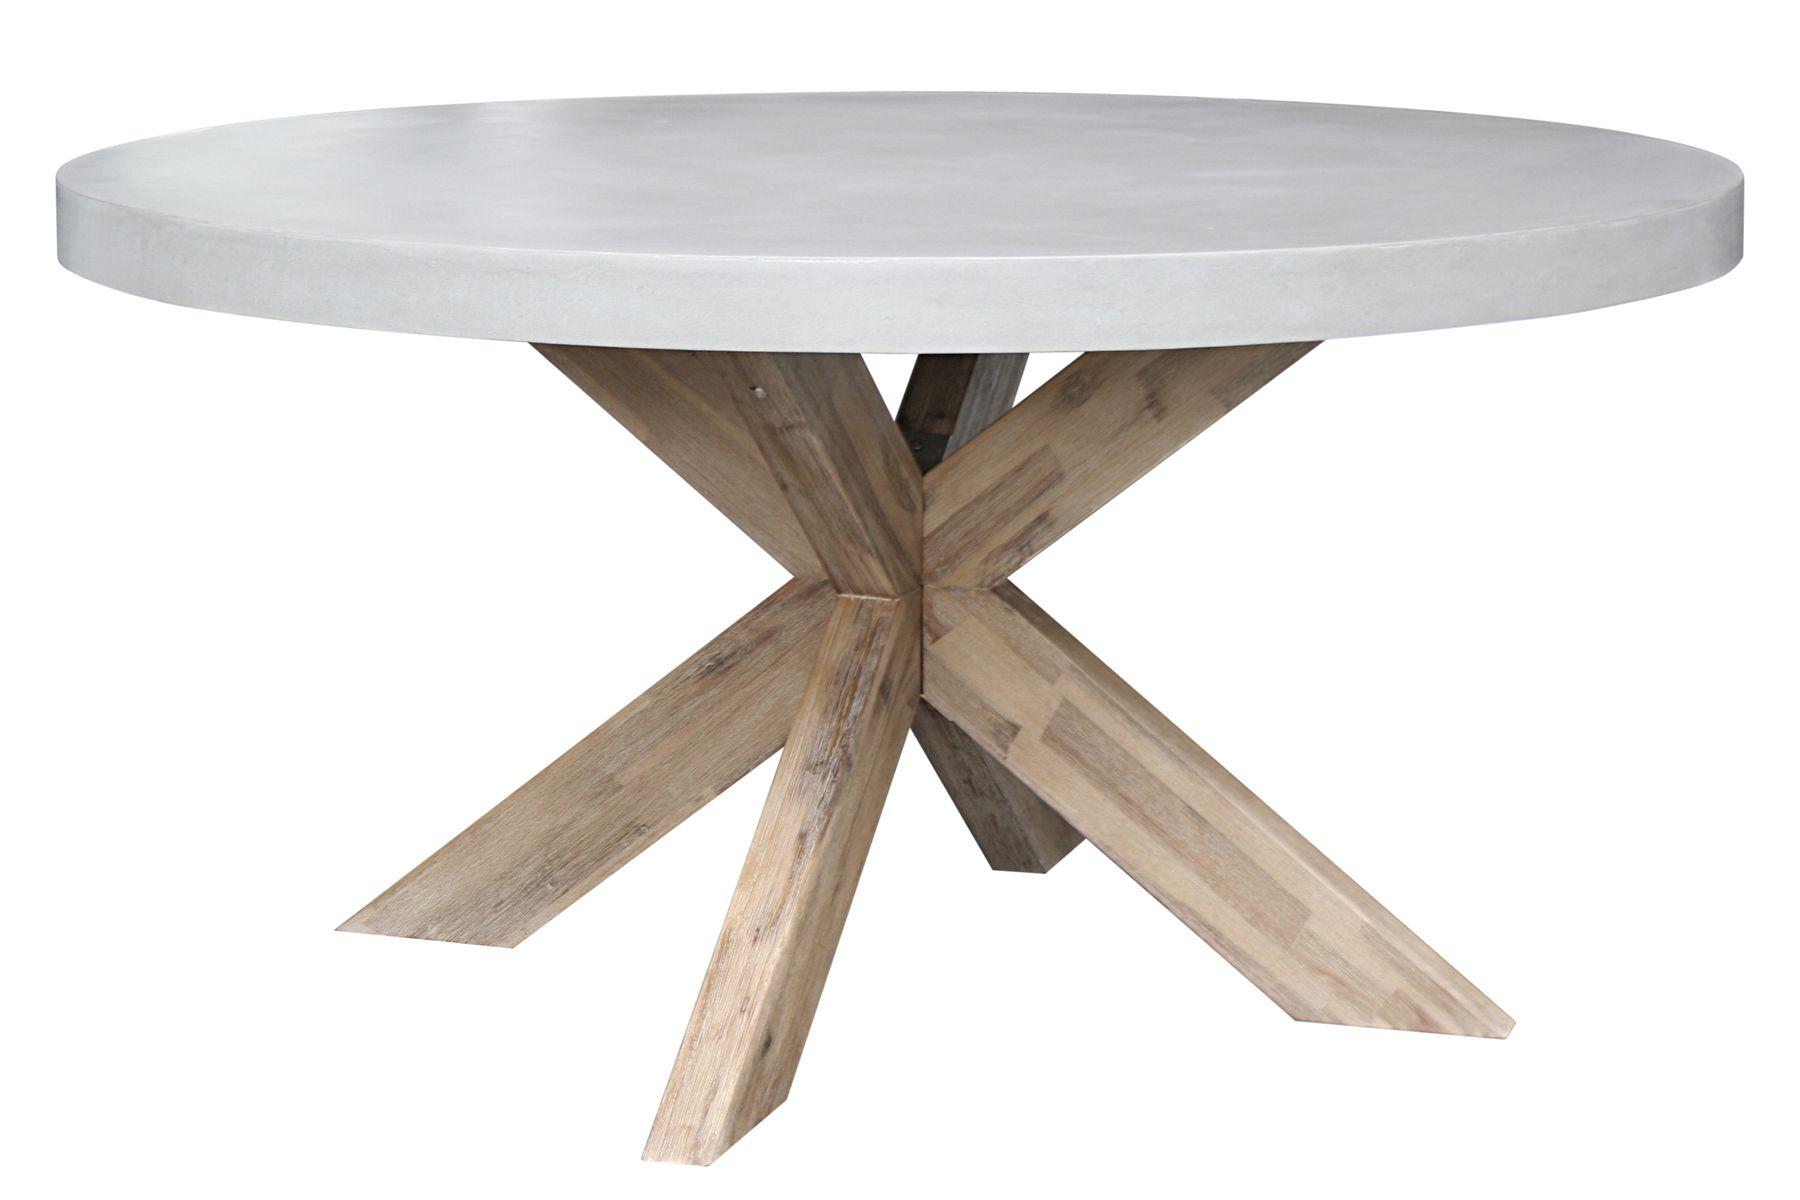 Ronde witte houten tuintafel van robuust hout Ook leuk